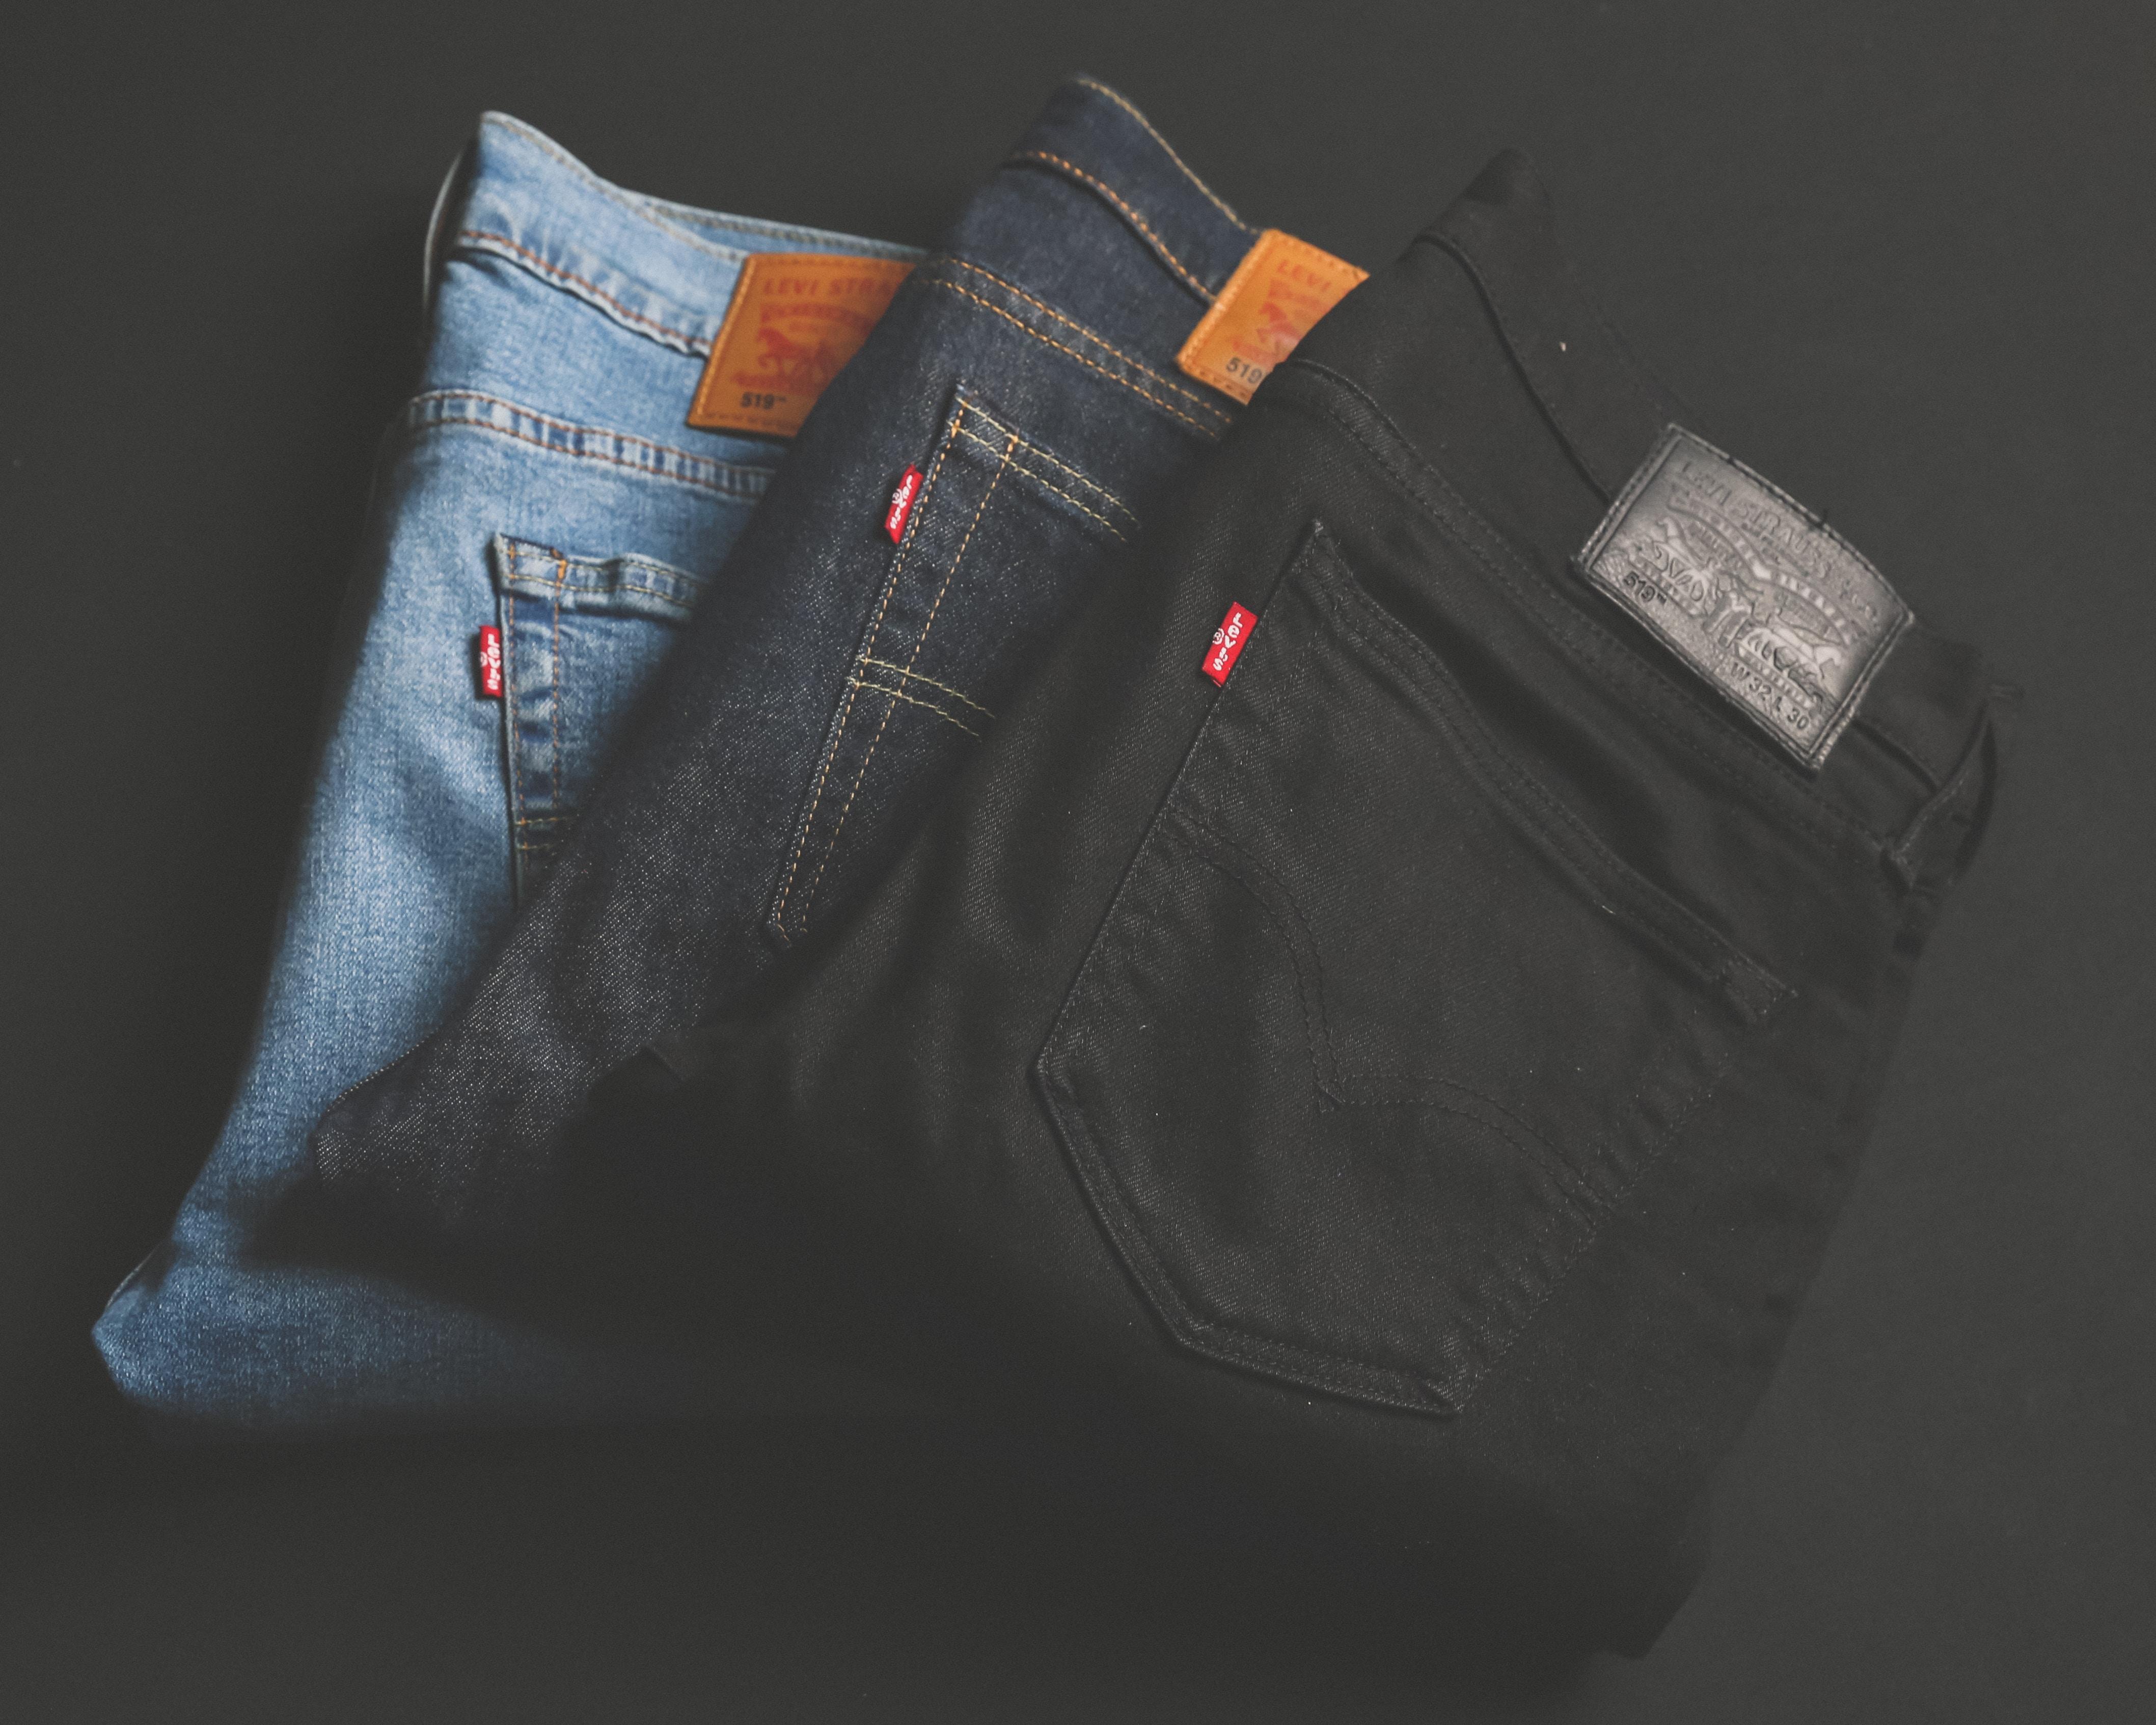 Jeans  jeans stories